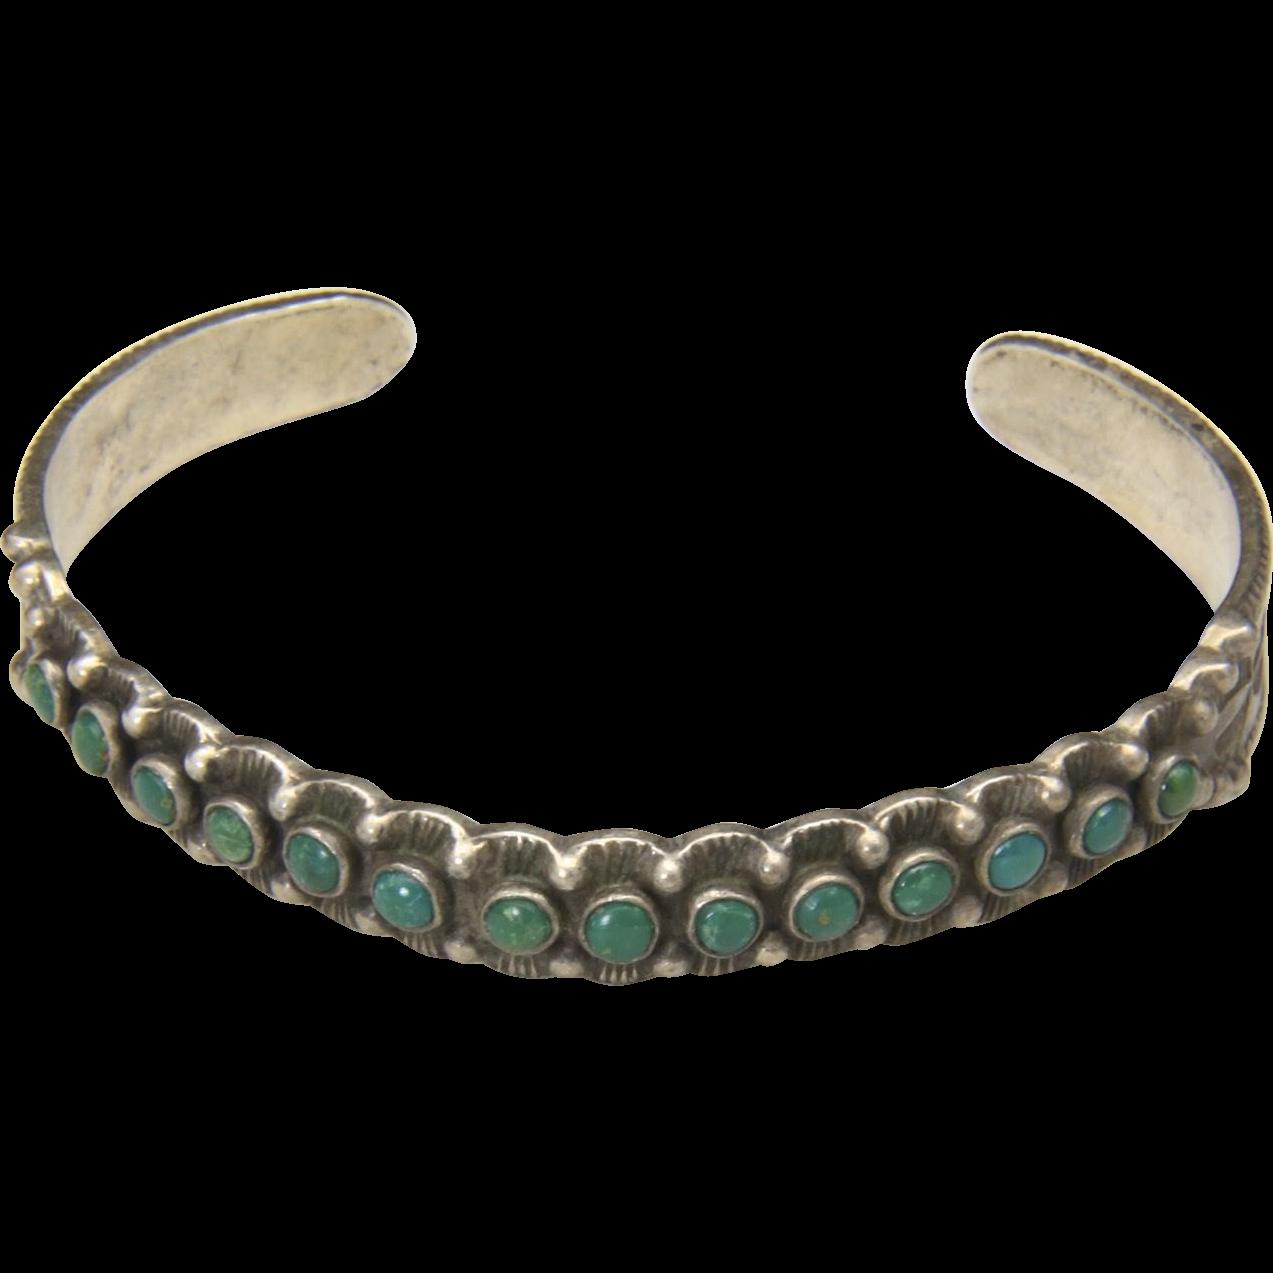 Vintage Maisels Sterling Silver Fourteen 14 Stone Turquoise Cuff Bracelet Arrow